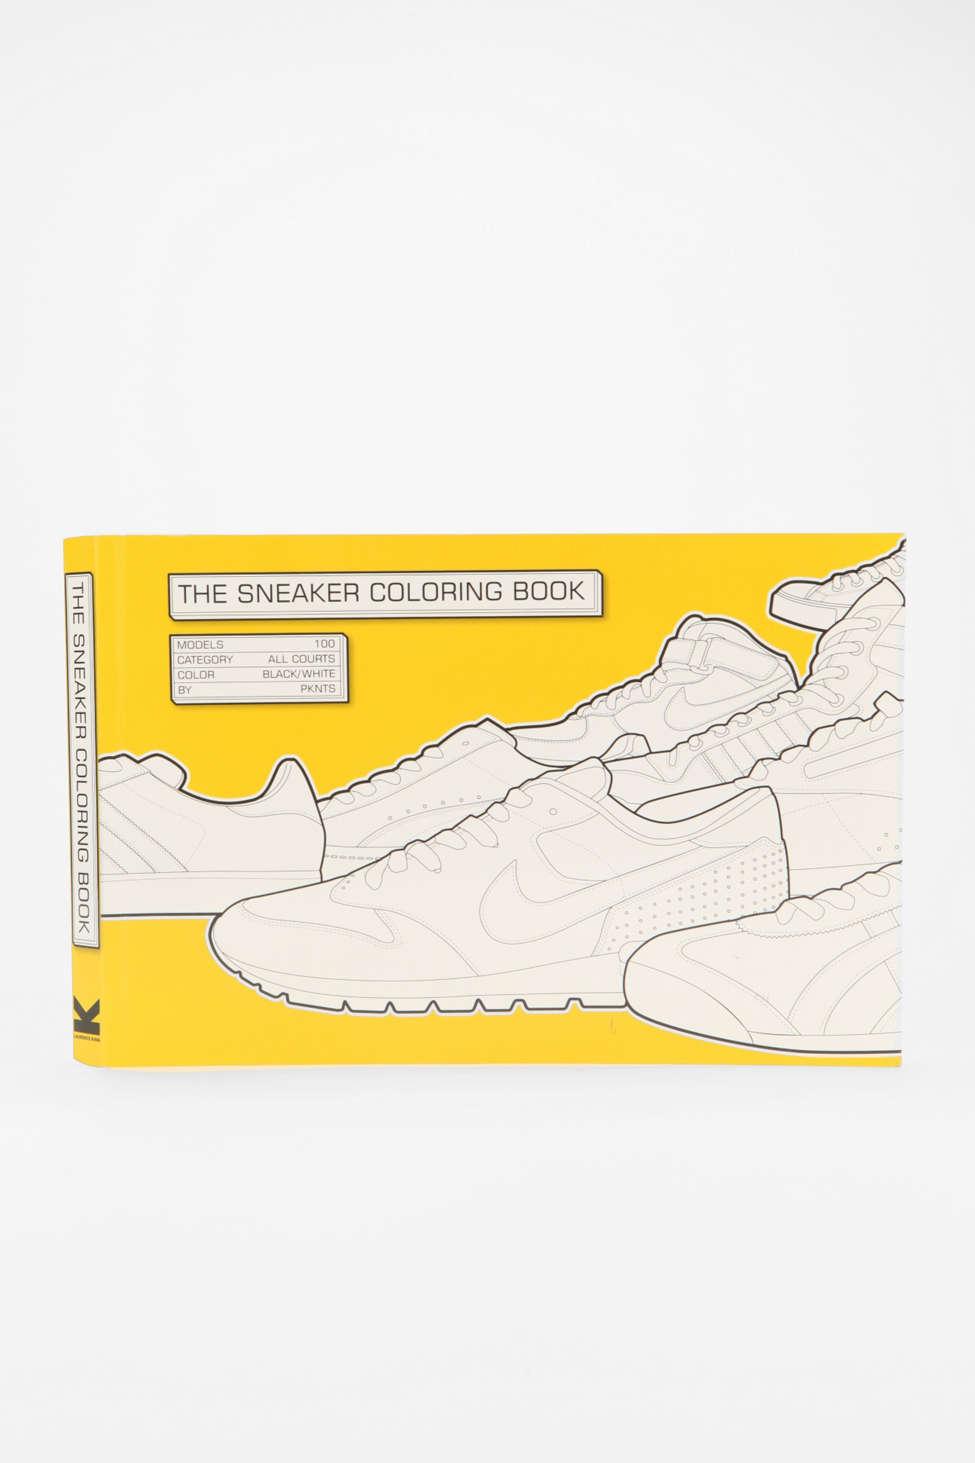 The Sneaker Coloring Book By Henrik Klingel Daniel Jarosch Urban